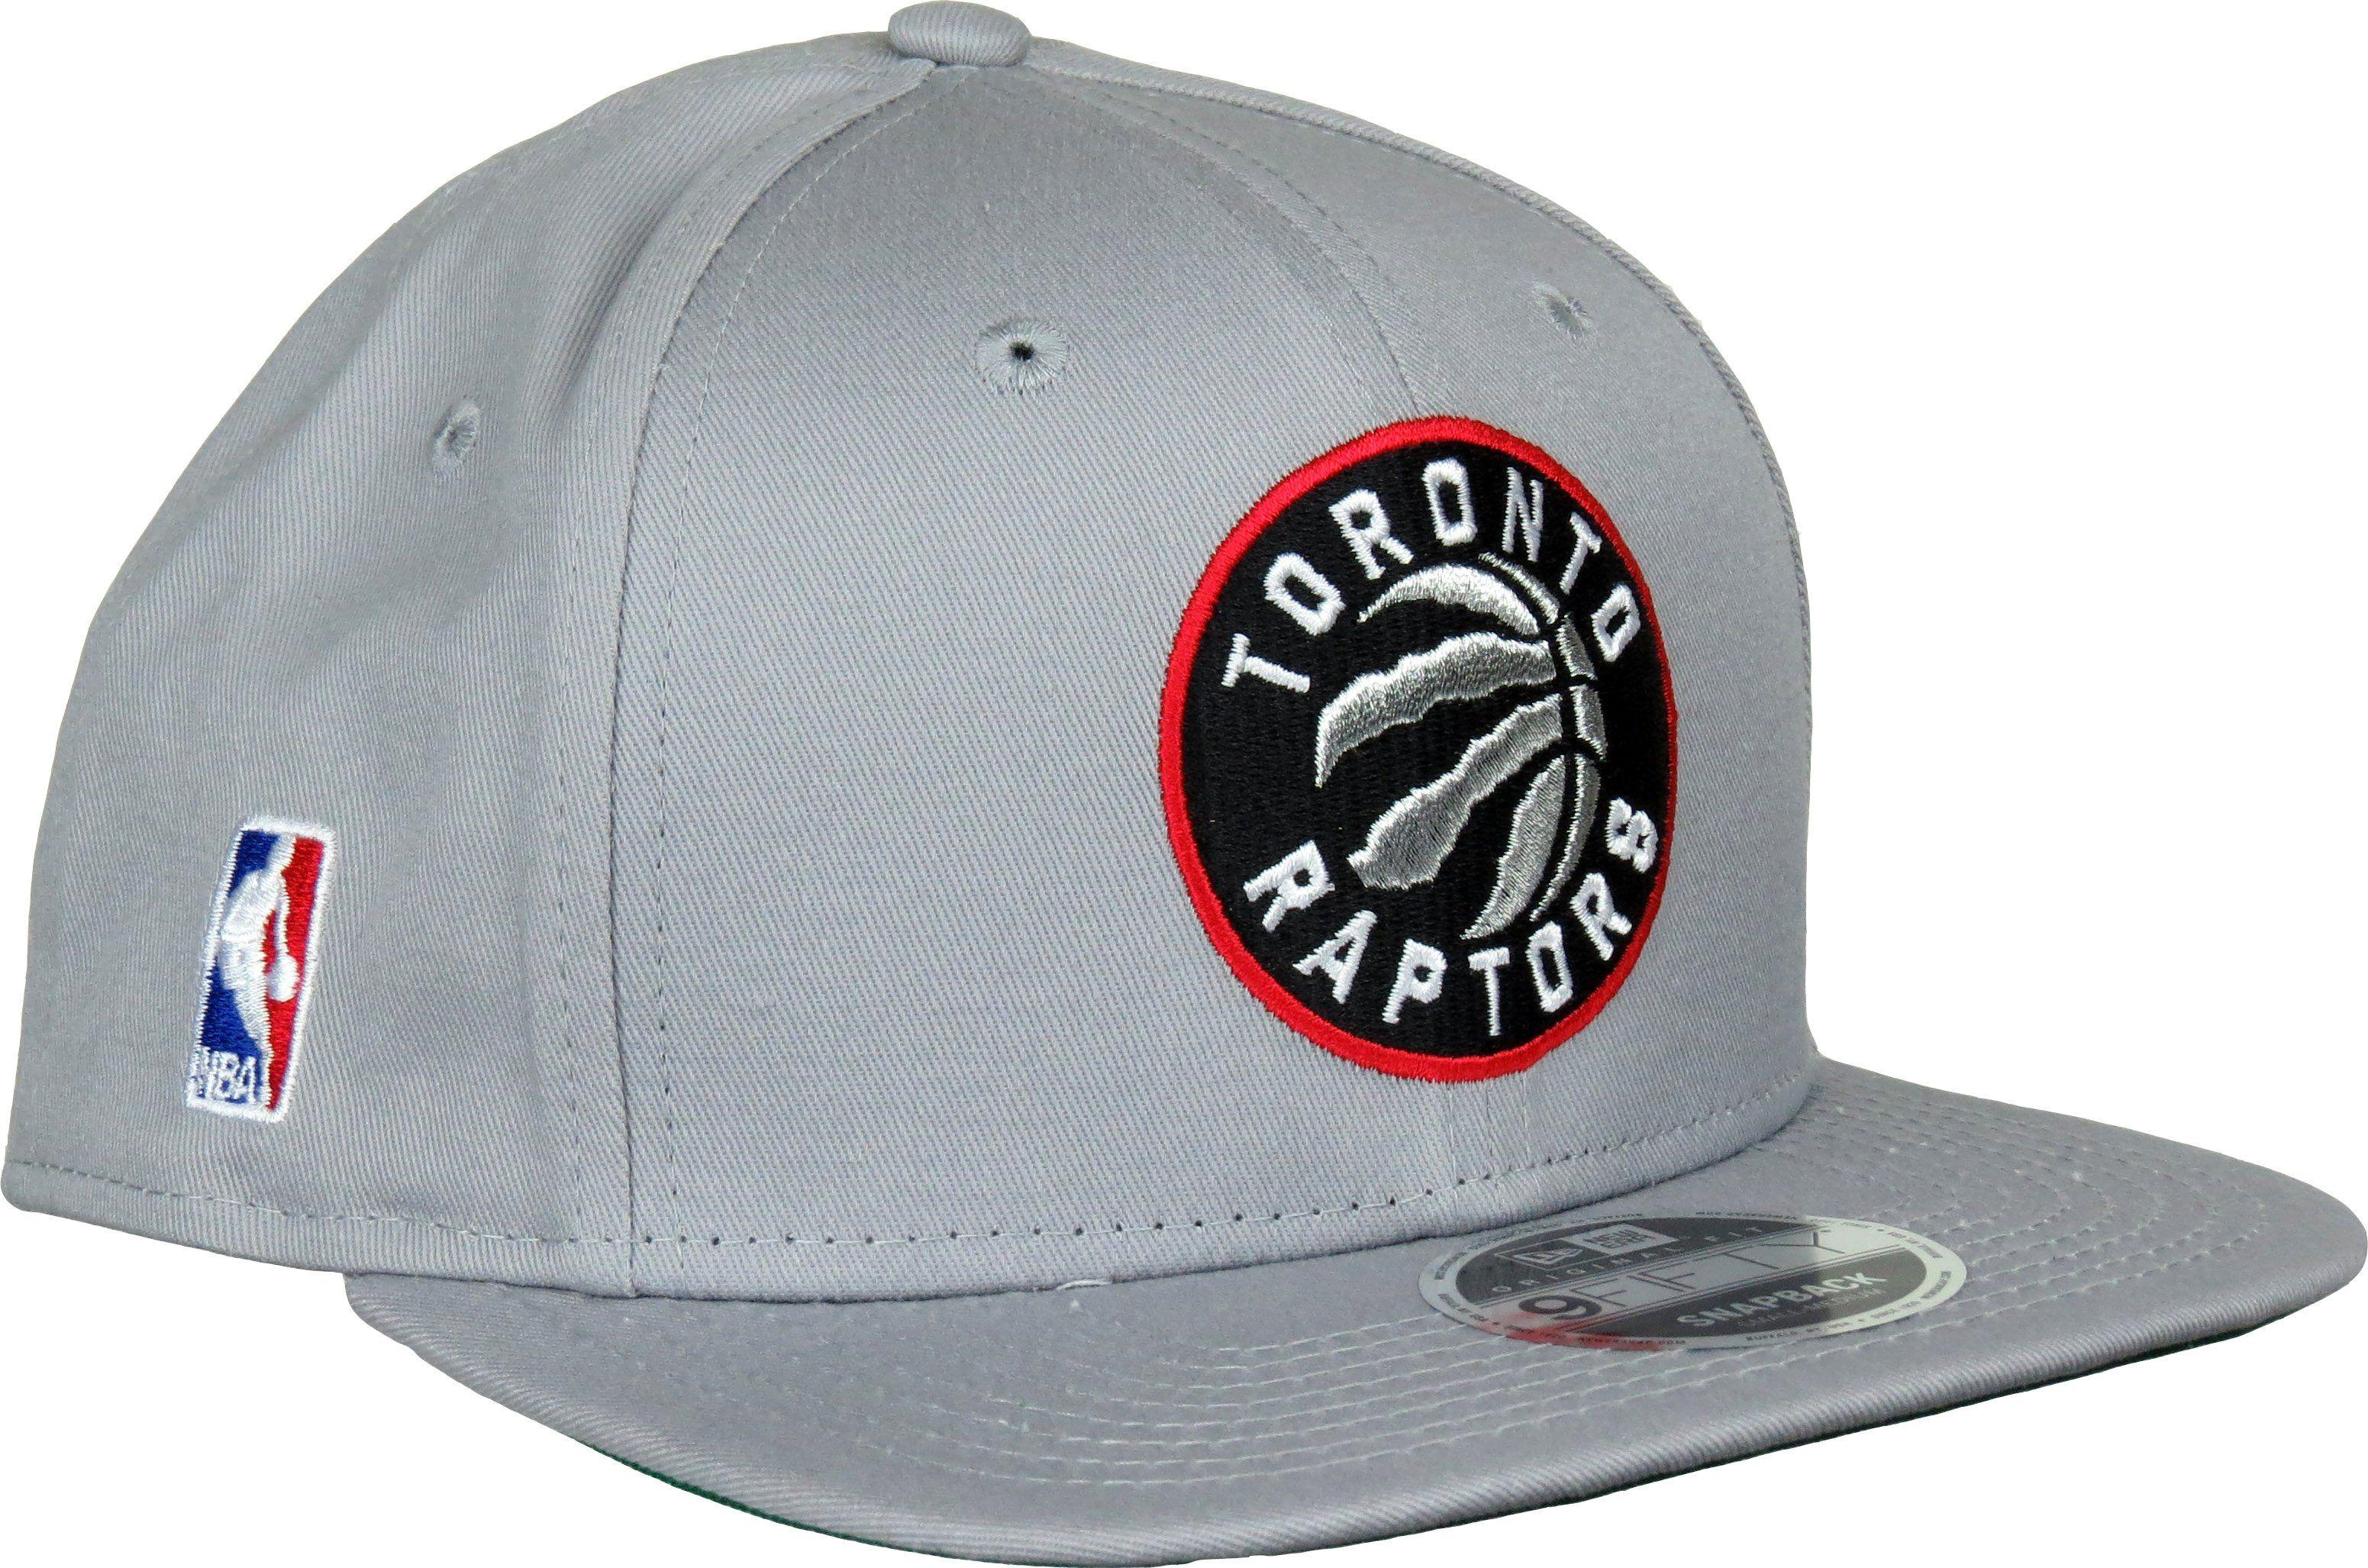 d829bfdb137755 New Era NBA Classic 950 Original Fit Snapback Cap. Grey with the Toronto  Raptors front logo, the New Era and NBA side logo's, and the Green Visor  underside.